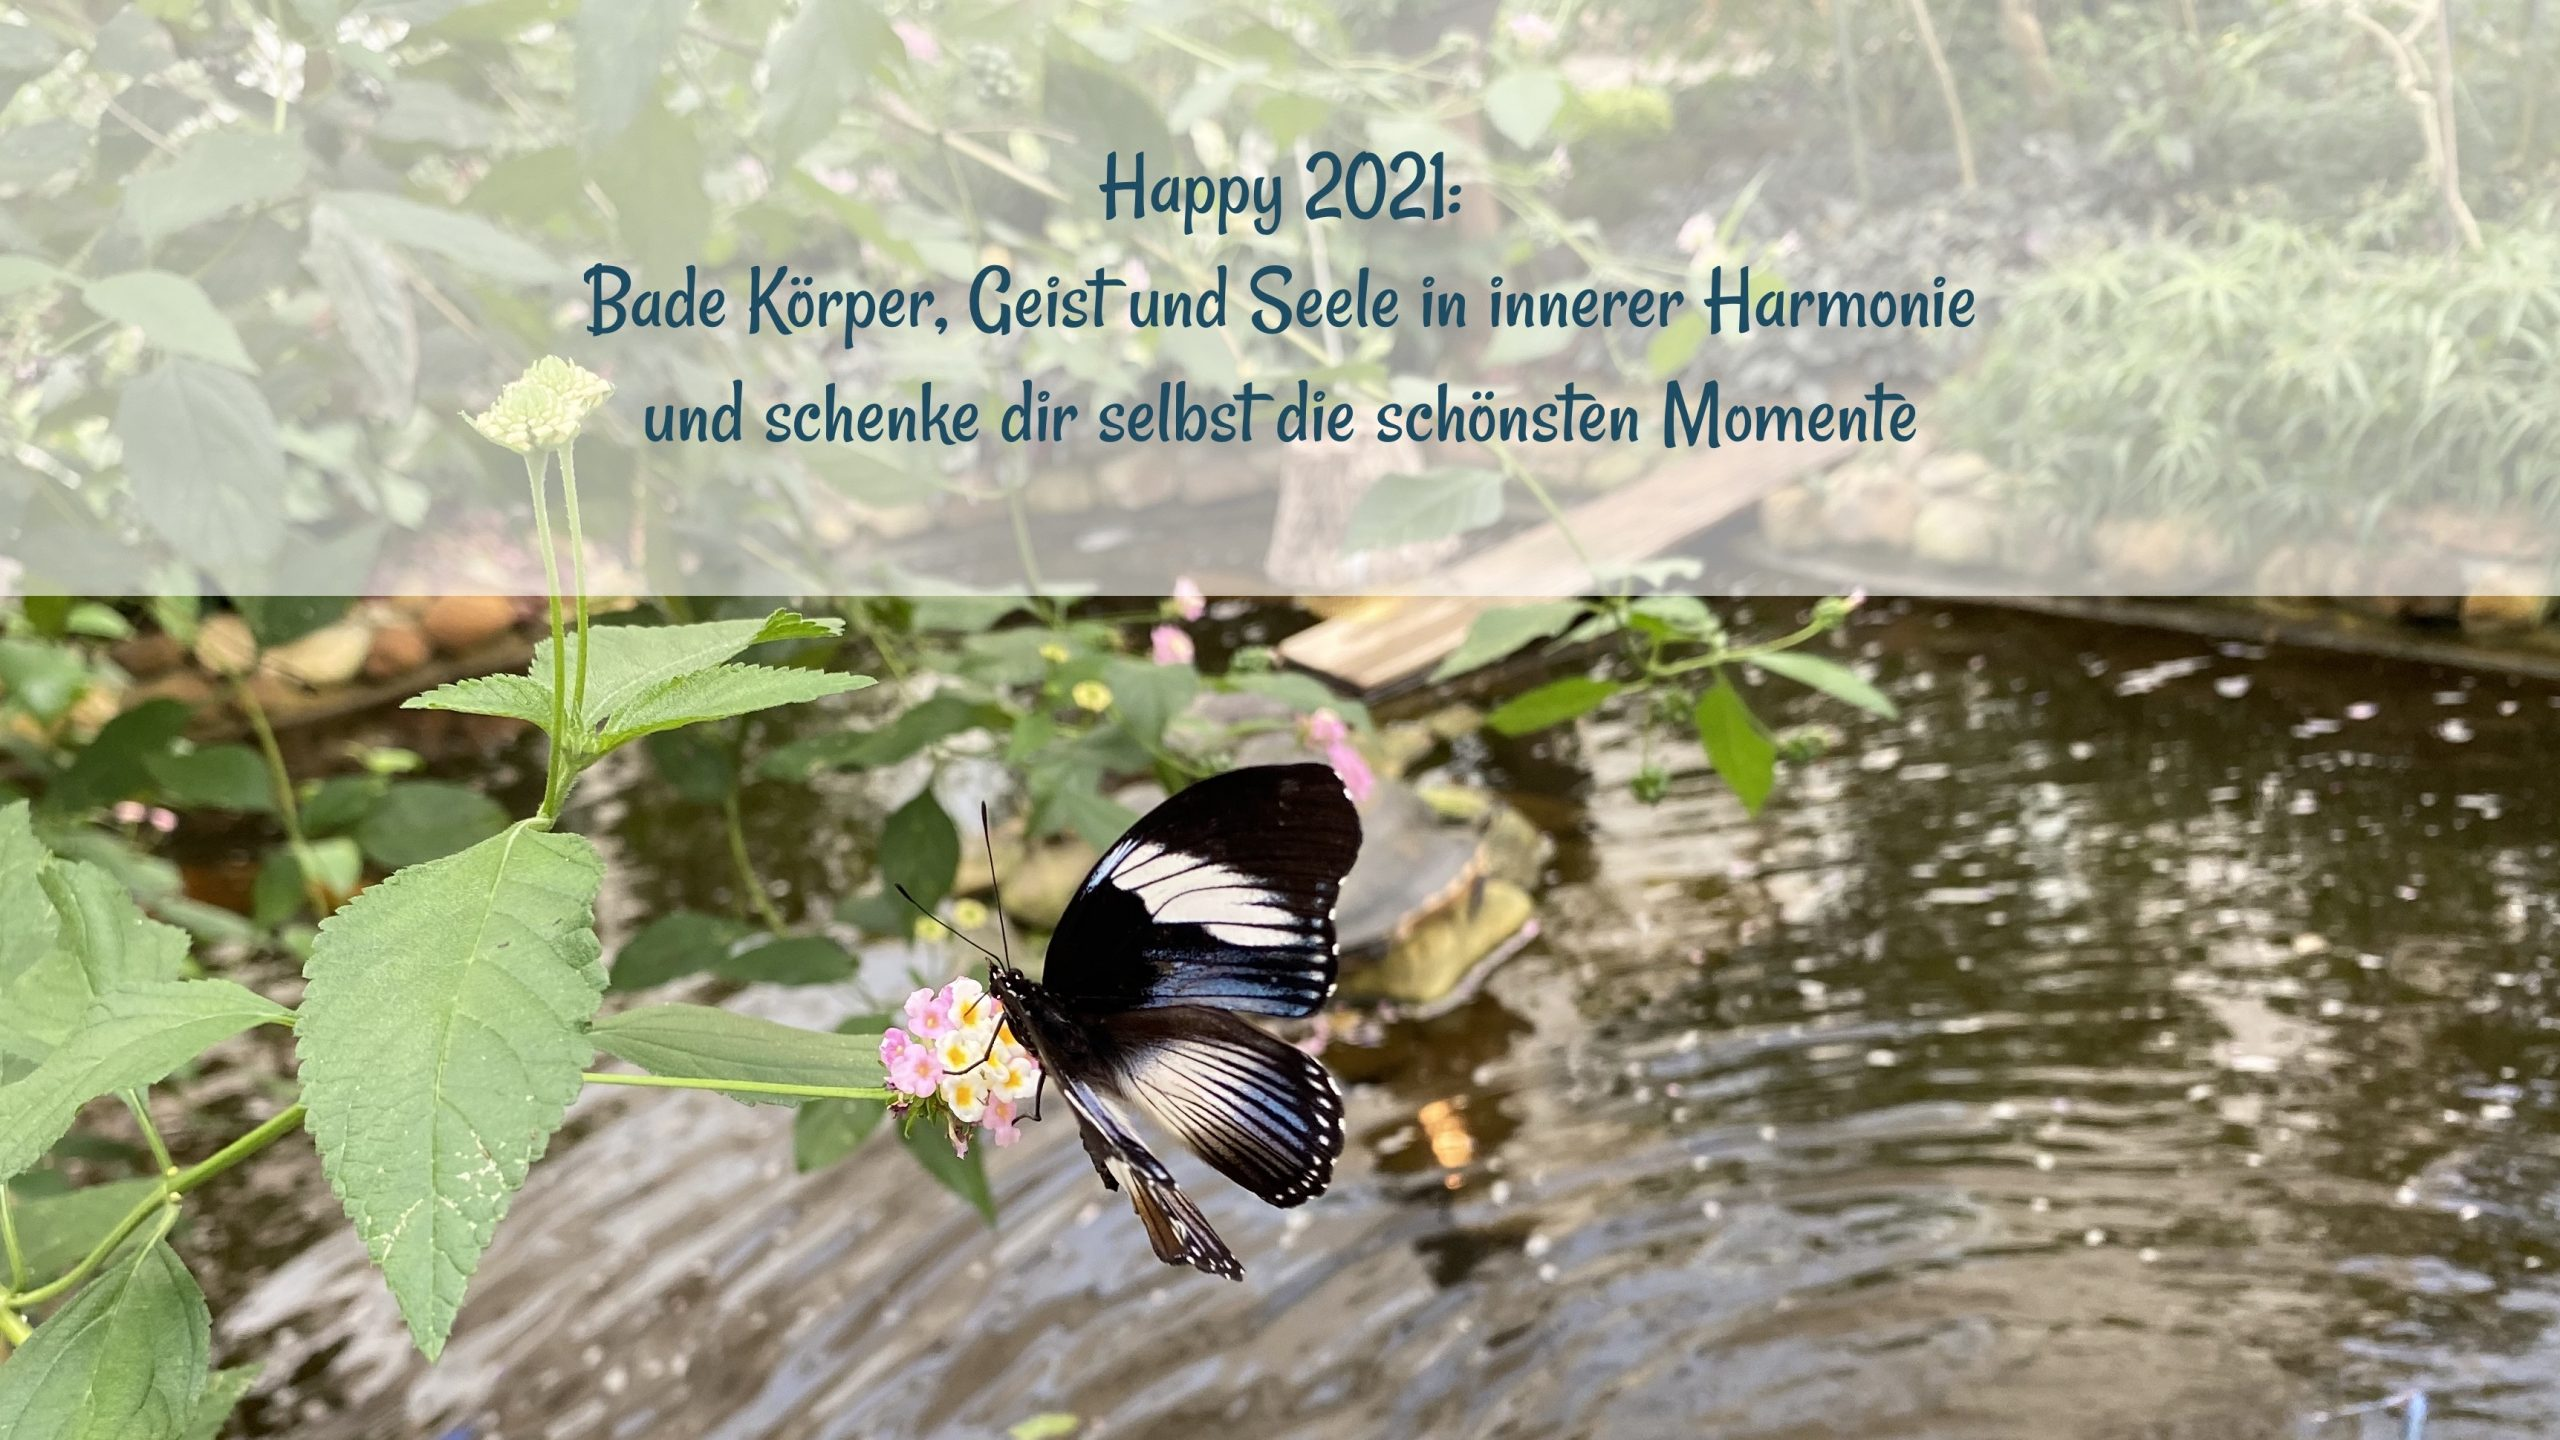 Yoga Feel-Good Hamburg Volksdorf Ahrensburg Entspannung Achtsamkeit Gesundheit Bianca Pagel Happy New Year